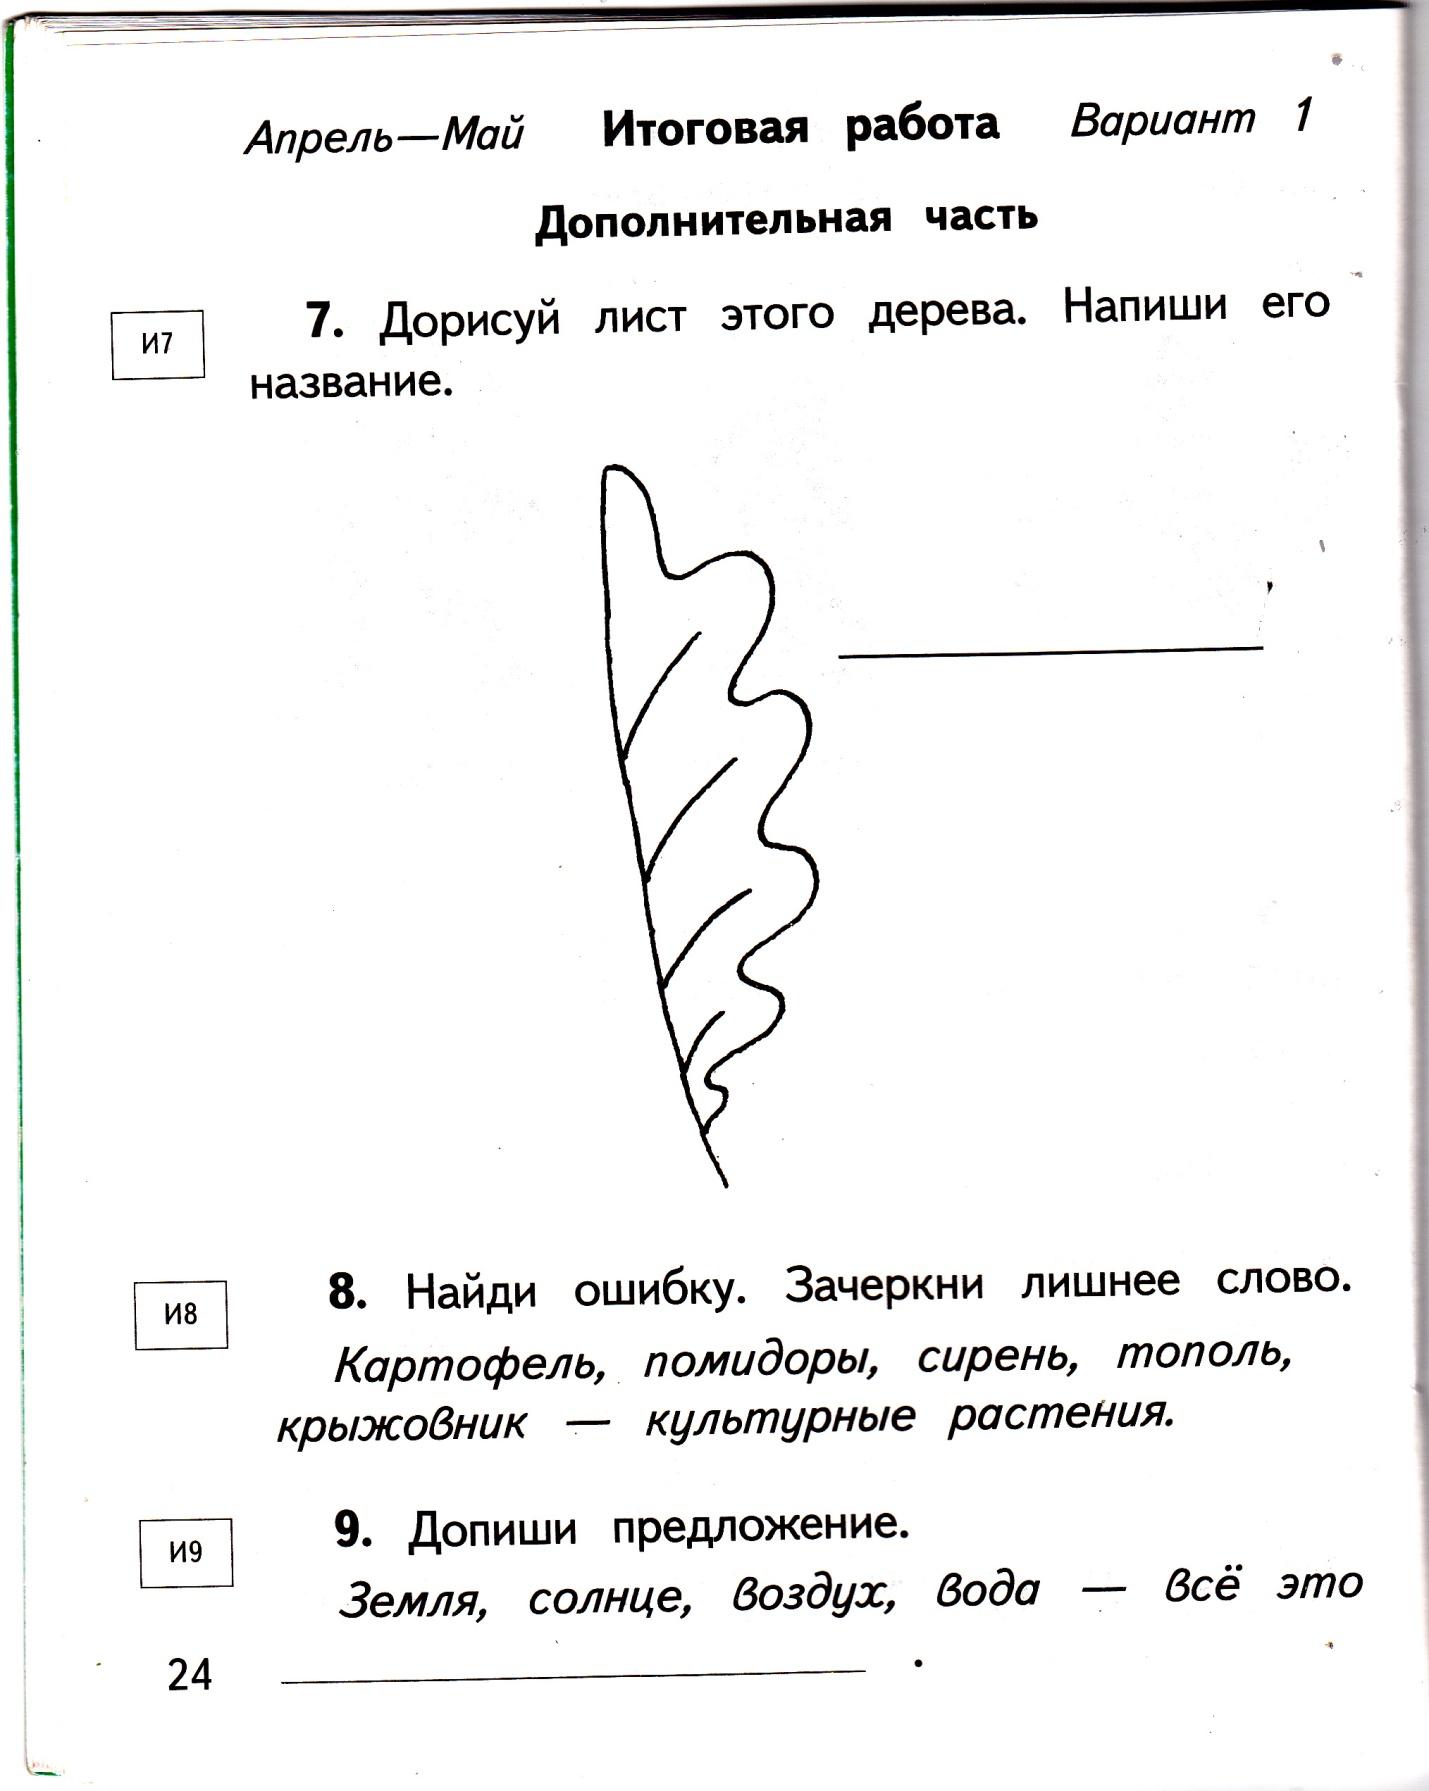 C:\Users\МБОУ СОШ № 4\Desktop\для Жуковой С.Н\IMG_0034.jpg